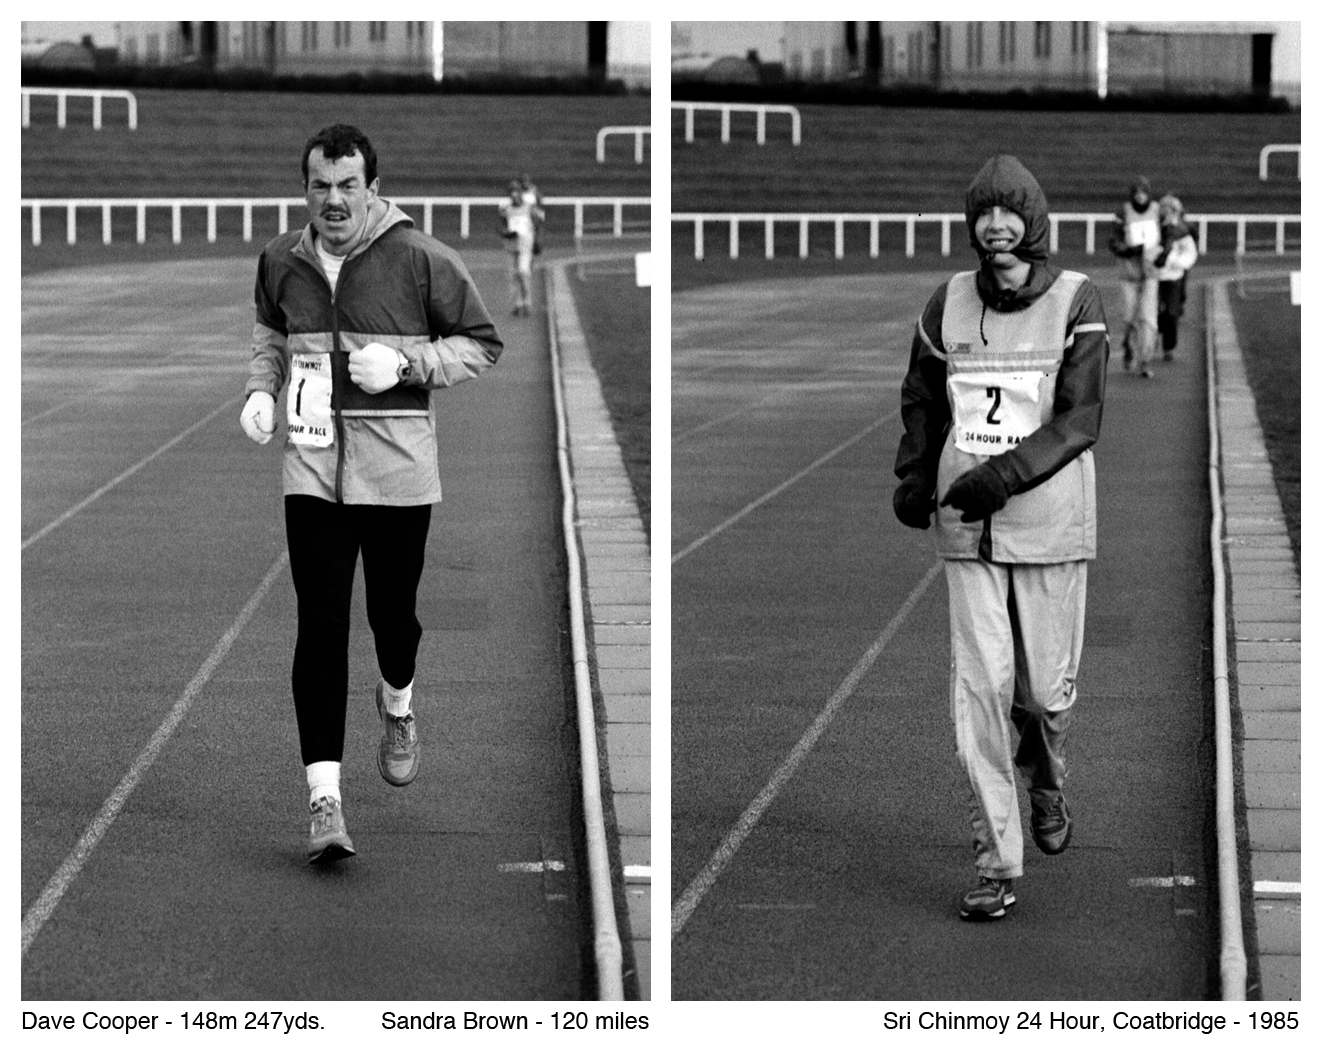 Sri Chinmoy 24 hour Race, 1985. Photo G MacIndoe